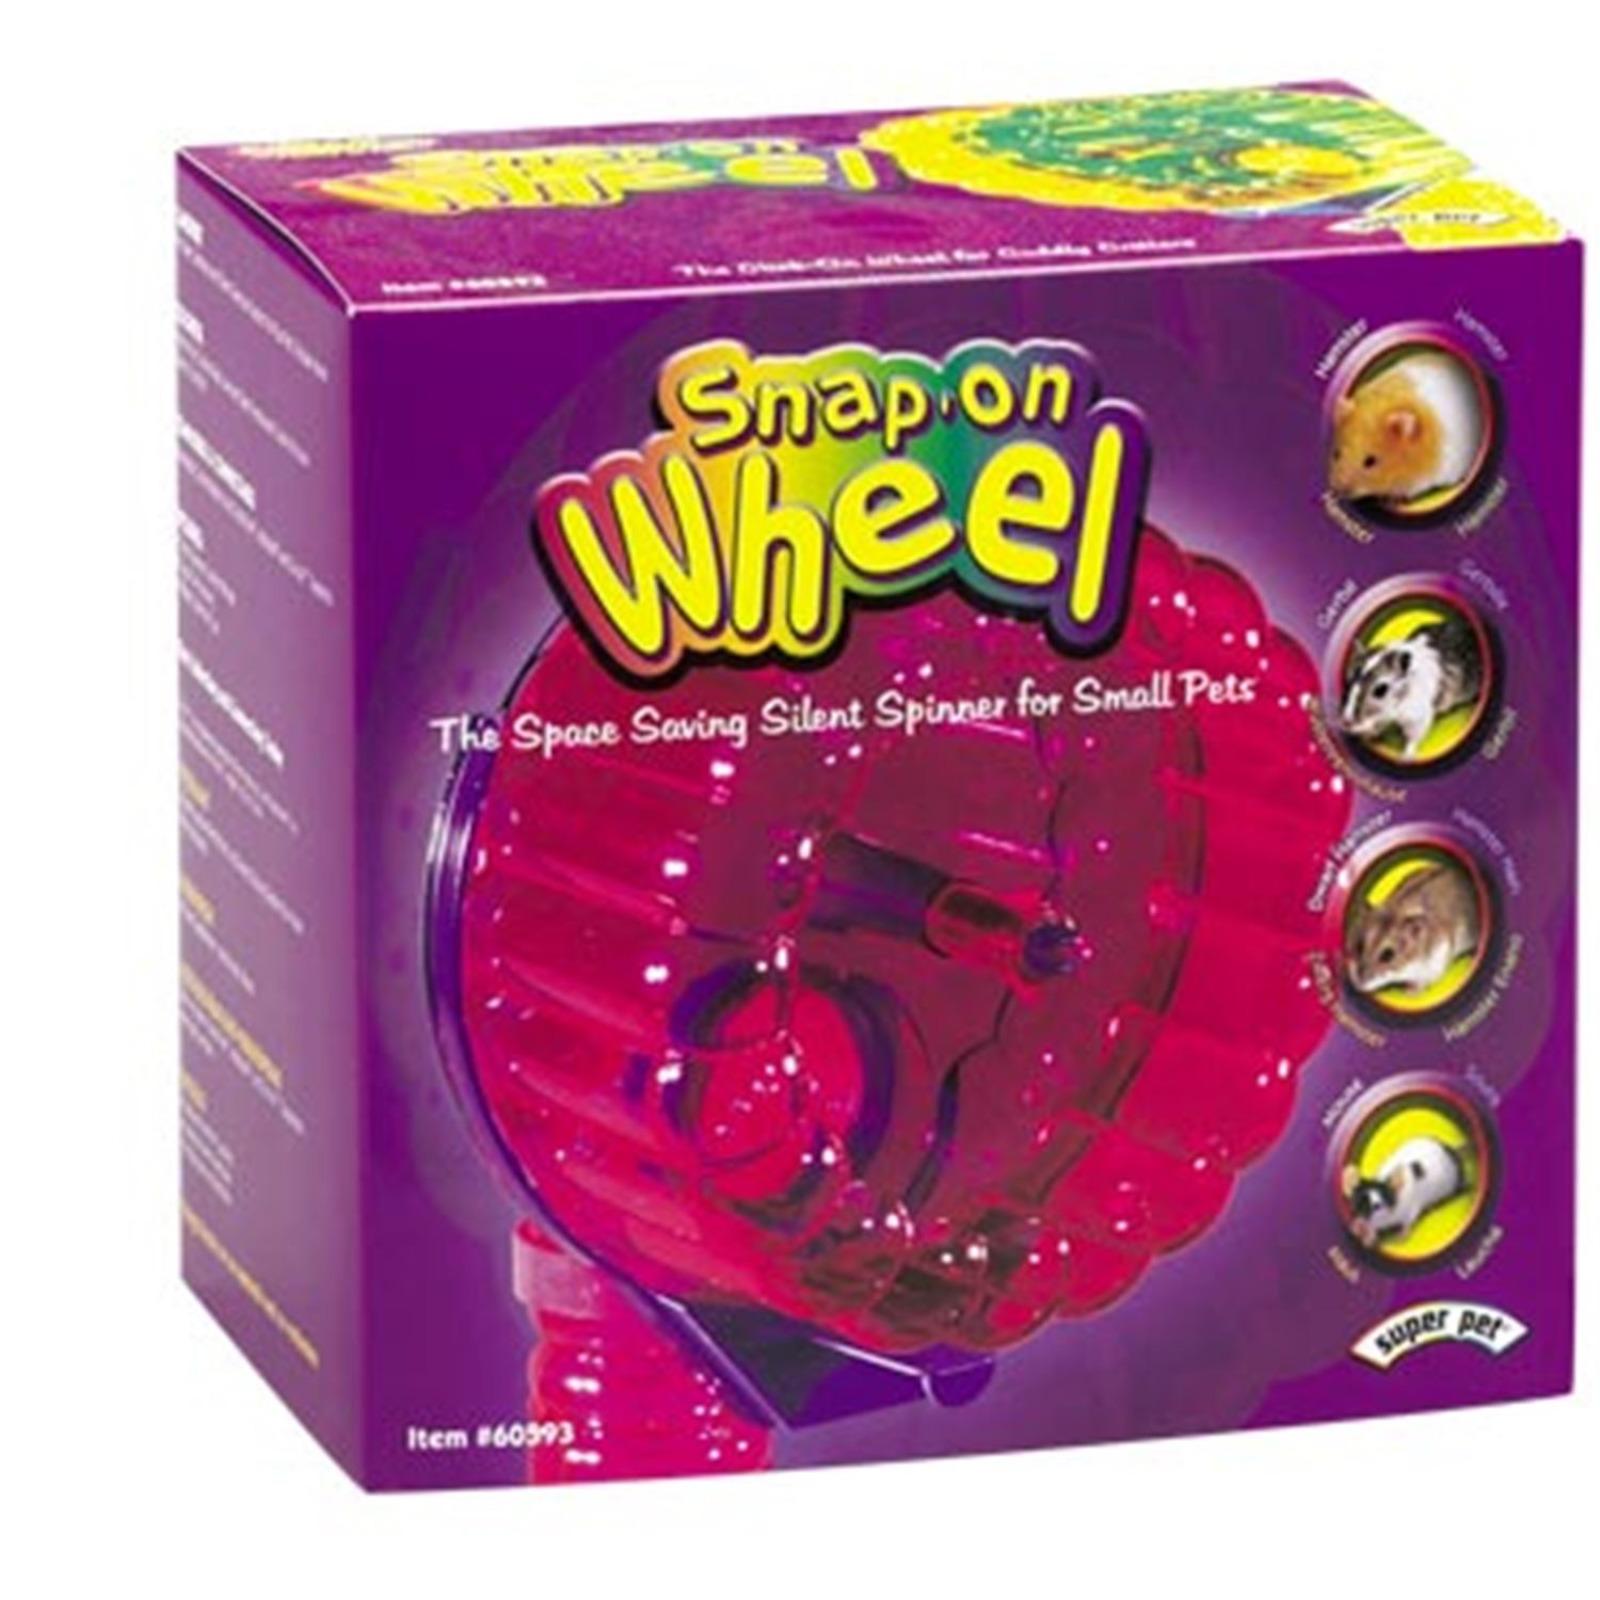 Super Pet Crittertrail Snap-On Wheel